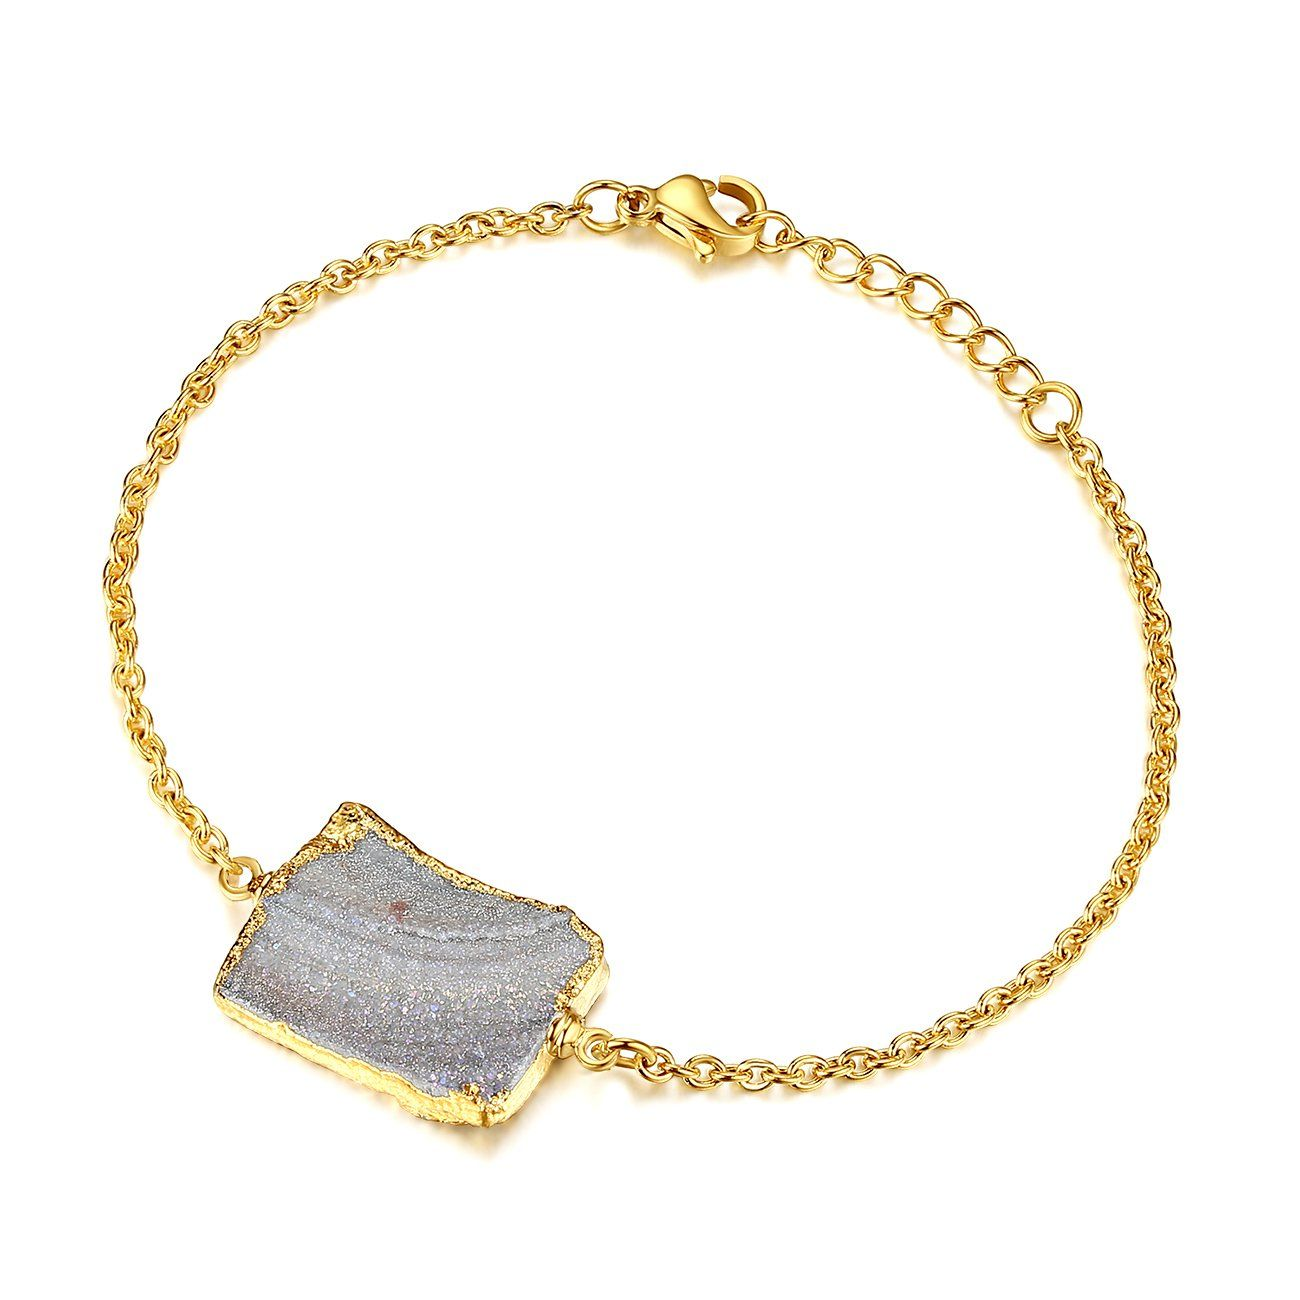 Jewellery Toughard Minimalist Handmade Natural Agate Druzy Charm